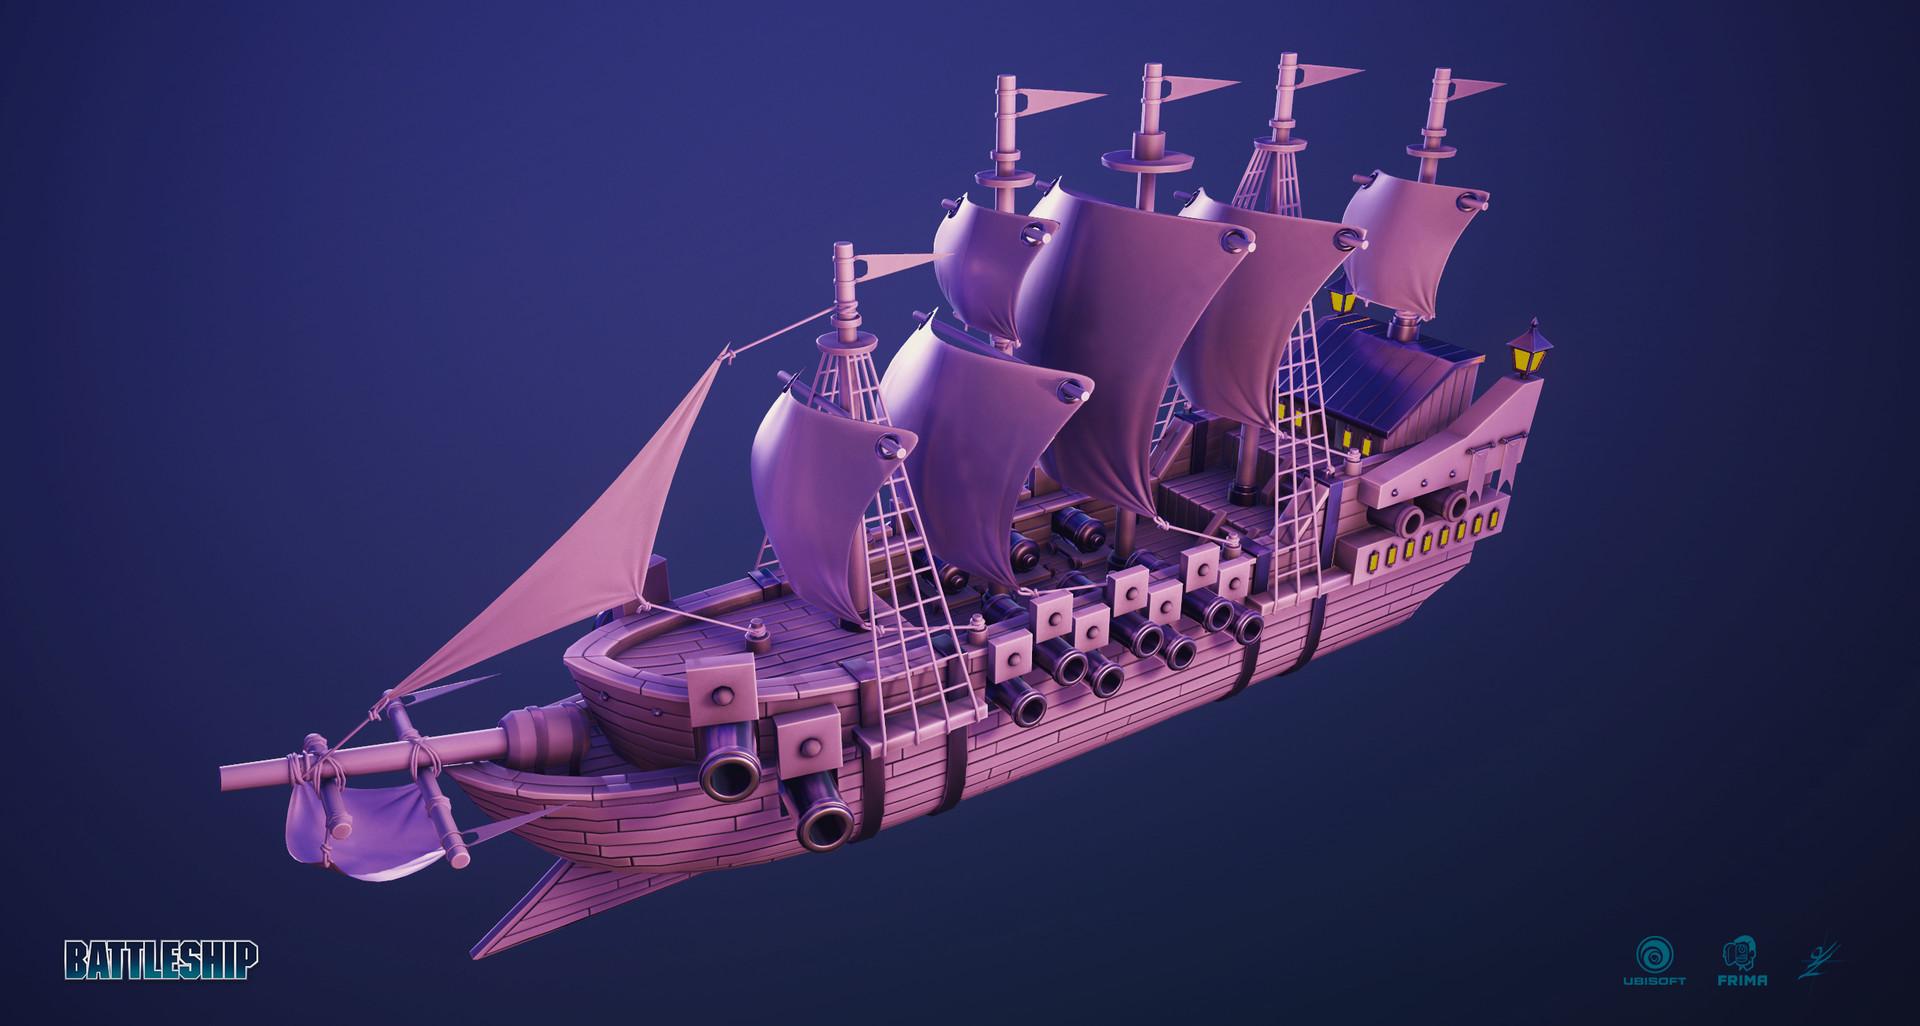 Guillaume lachance pirate battleship 02